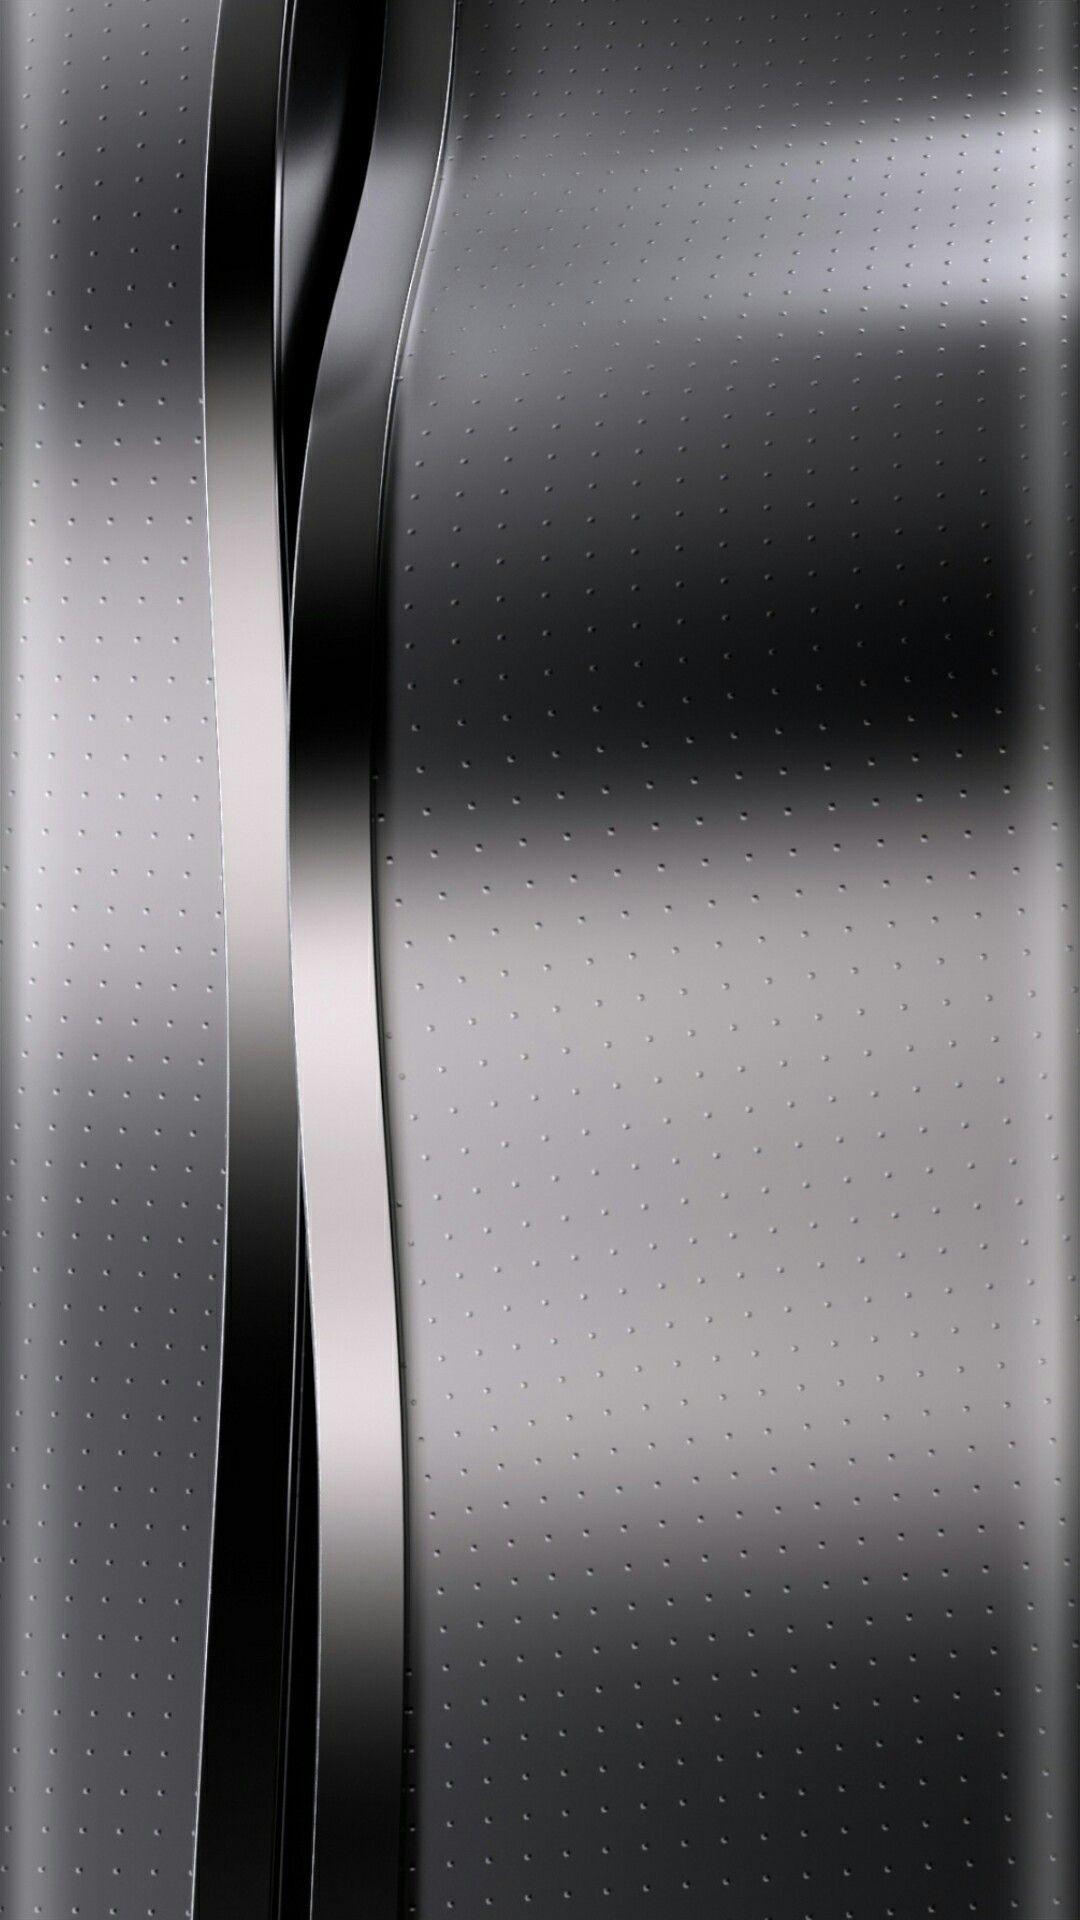 Silver And Black Chrome Wallpaper Wallpaper Edge, Metallic Wallpaper